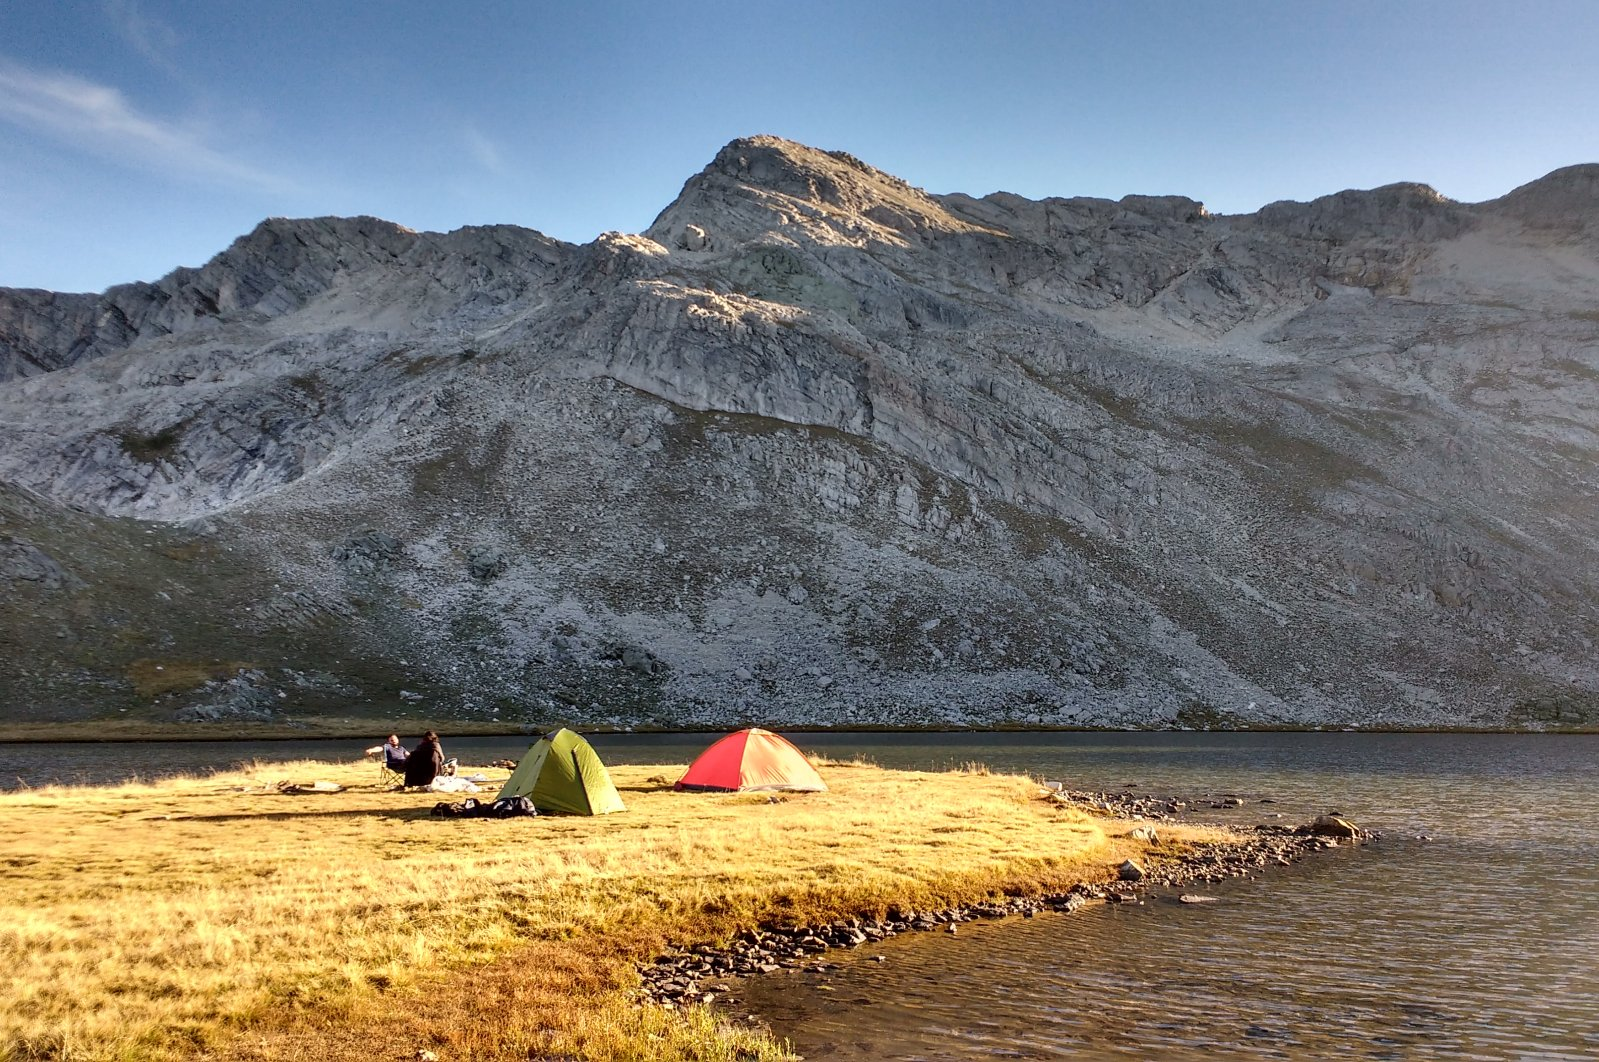 Campers pitch their tents beside Aynalı Göl near the summit of Mount Uludağ, Bursa, Turkey. (Gabriela Akpaça / Daily Sabah)